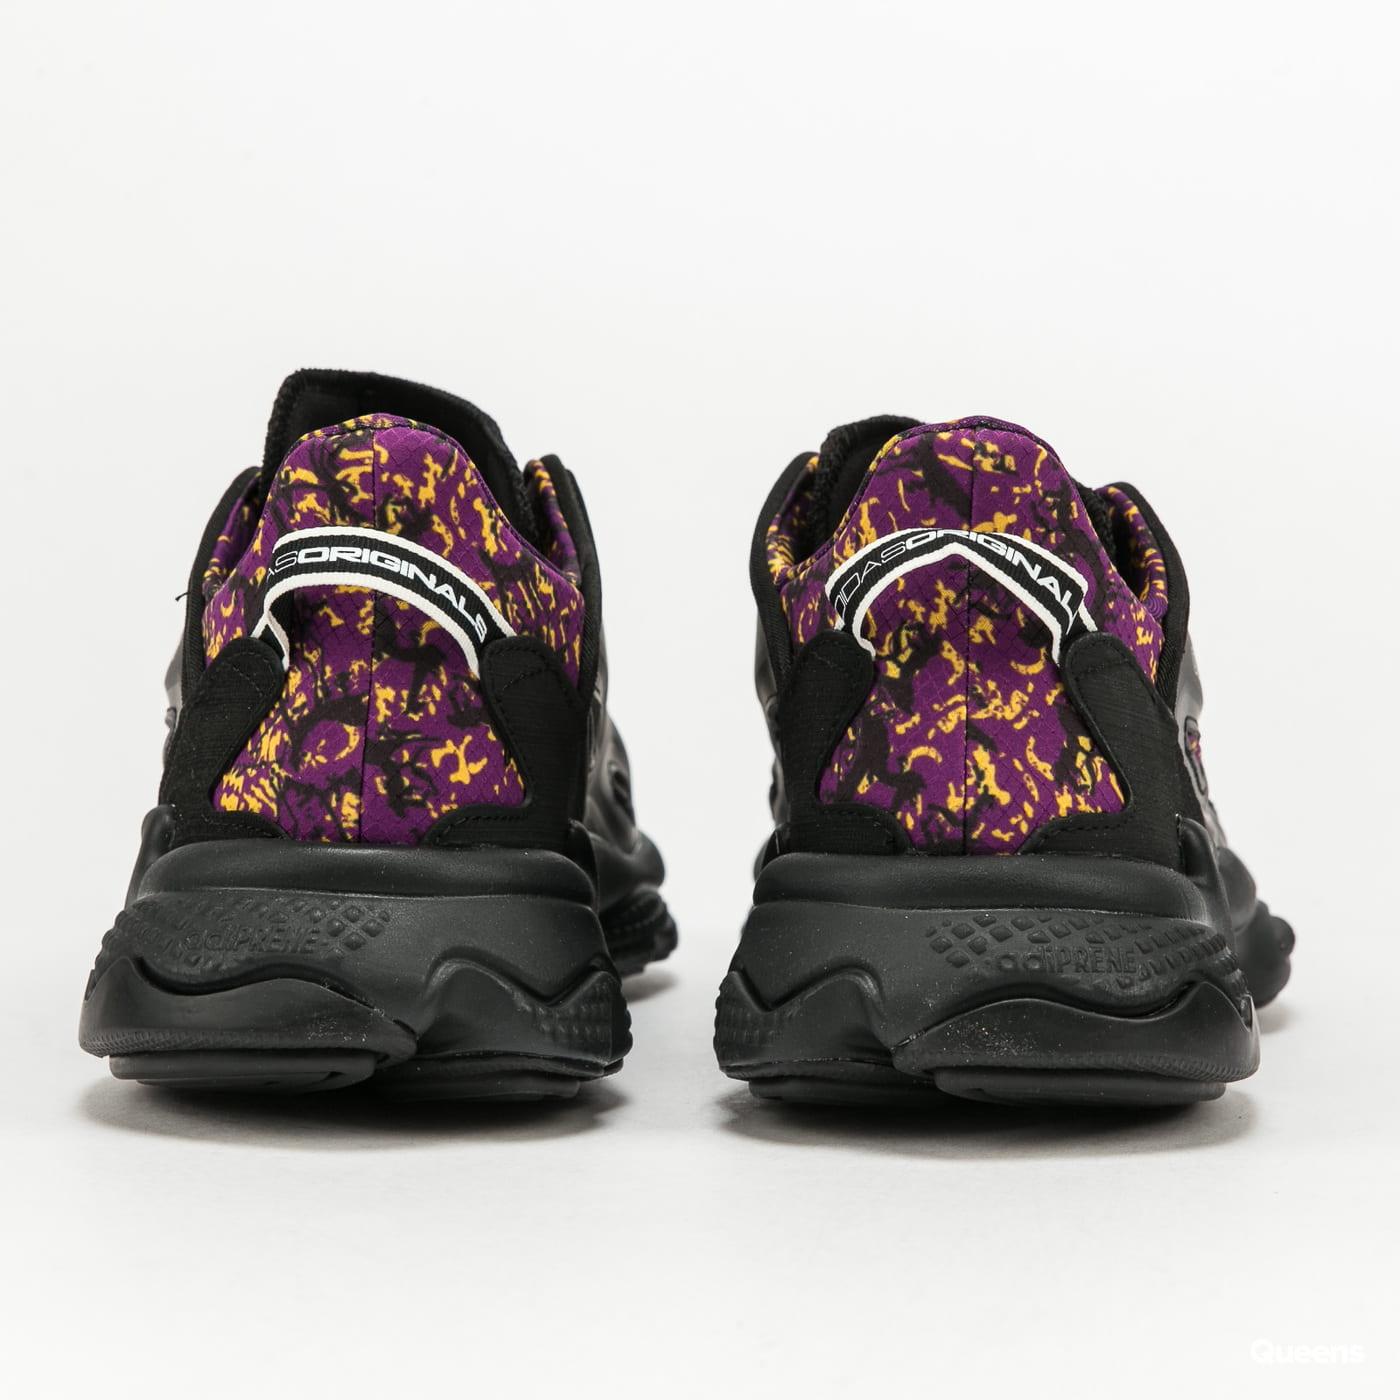 adidas Originals Ozweego Celox cblack / cblack / gloprp